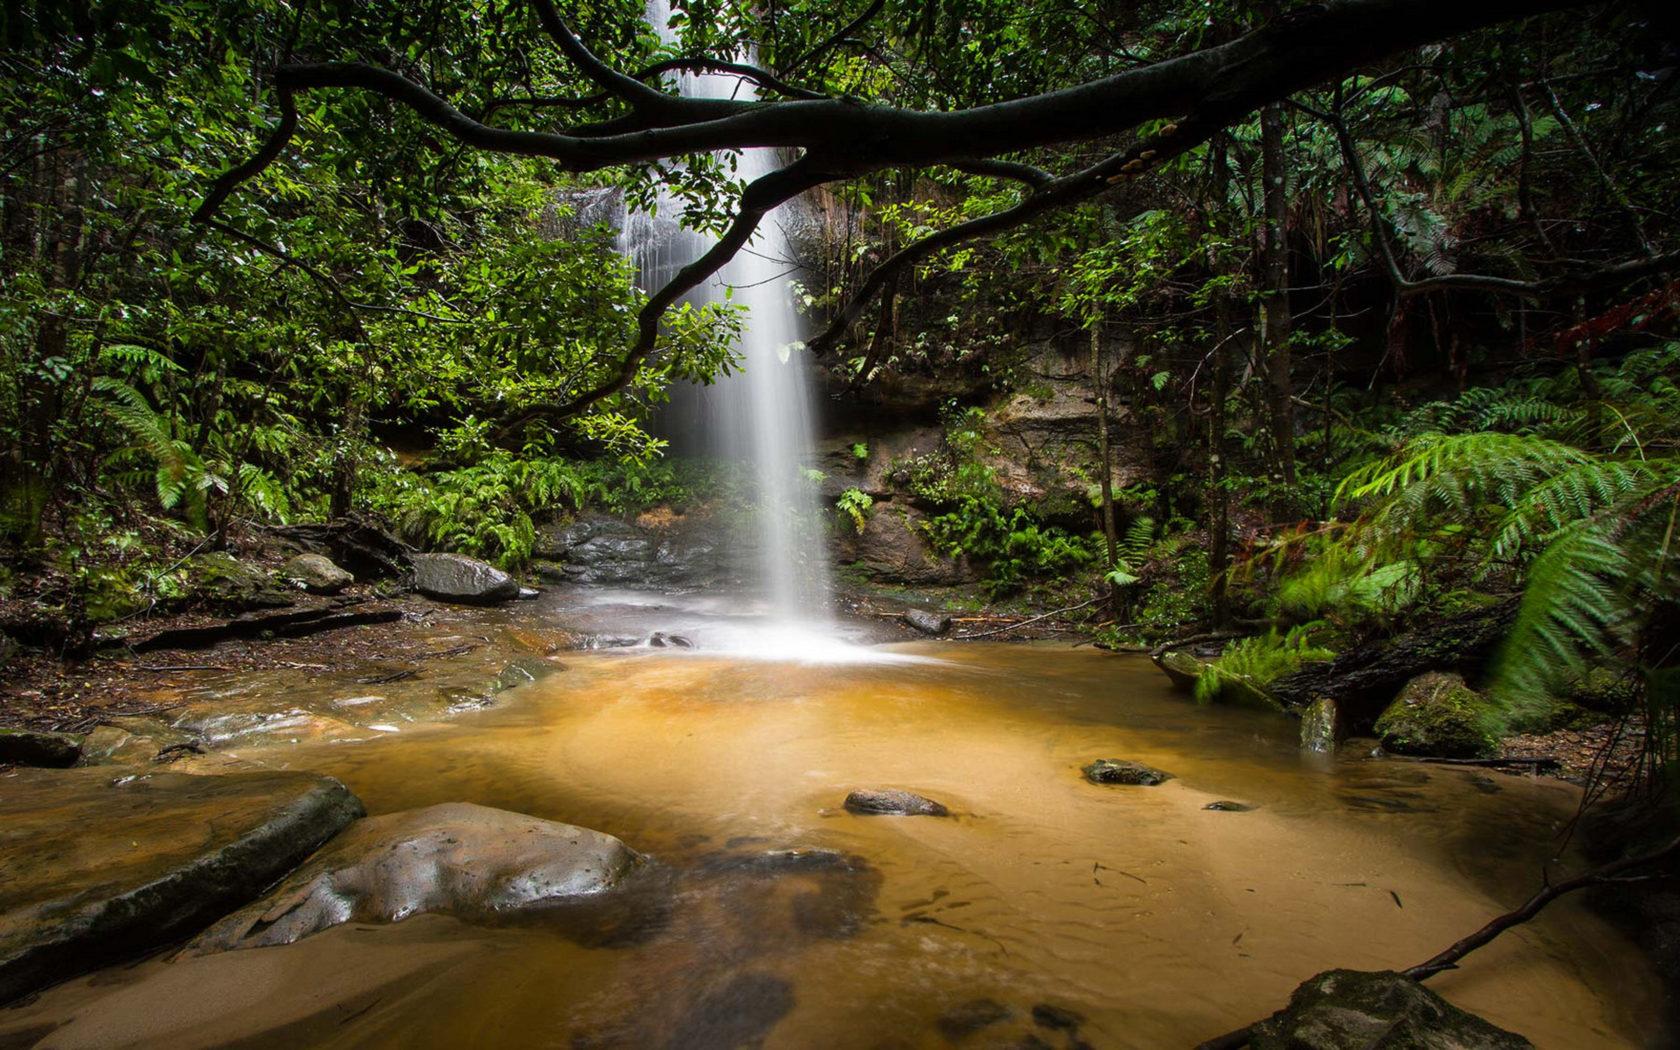 Niagara Falls Wallpaper Free Download Beautiful Waterfall Deep In The Jungle Adeline Falls South